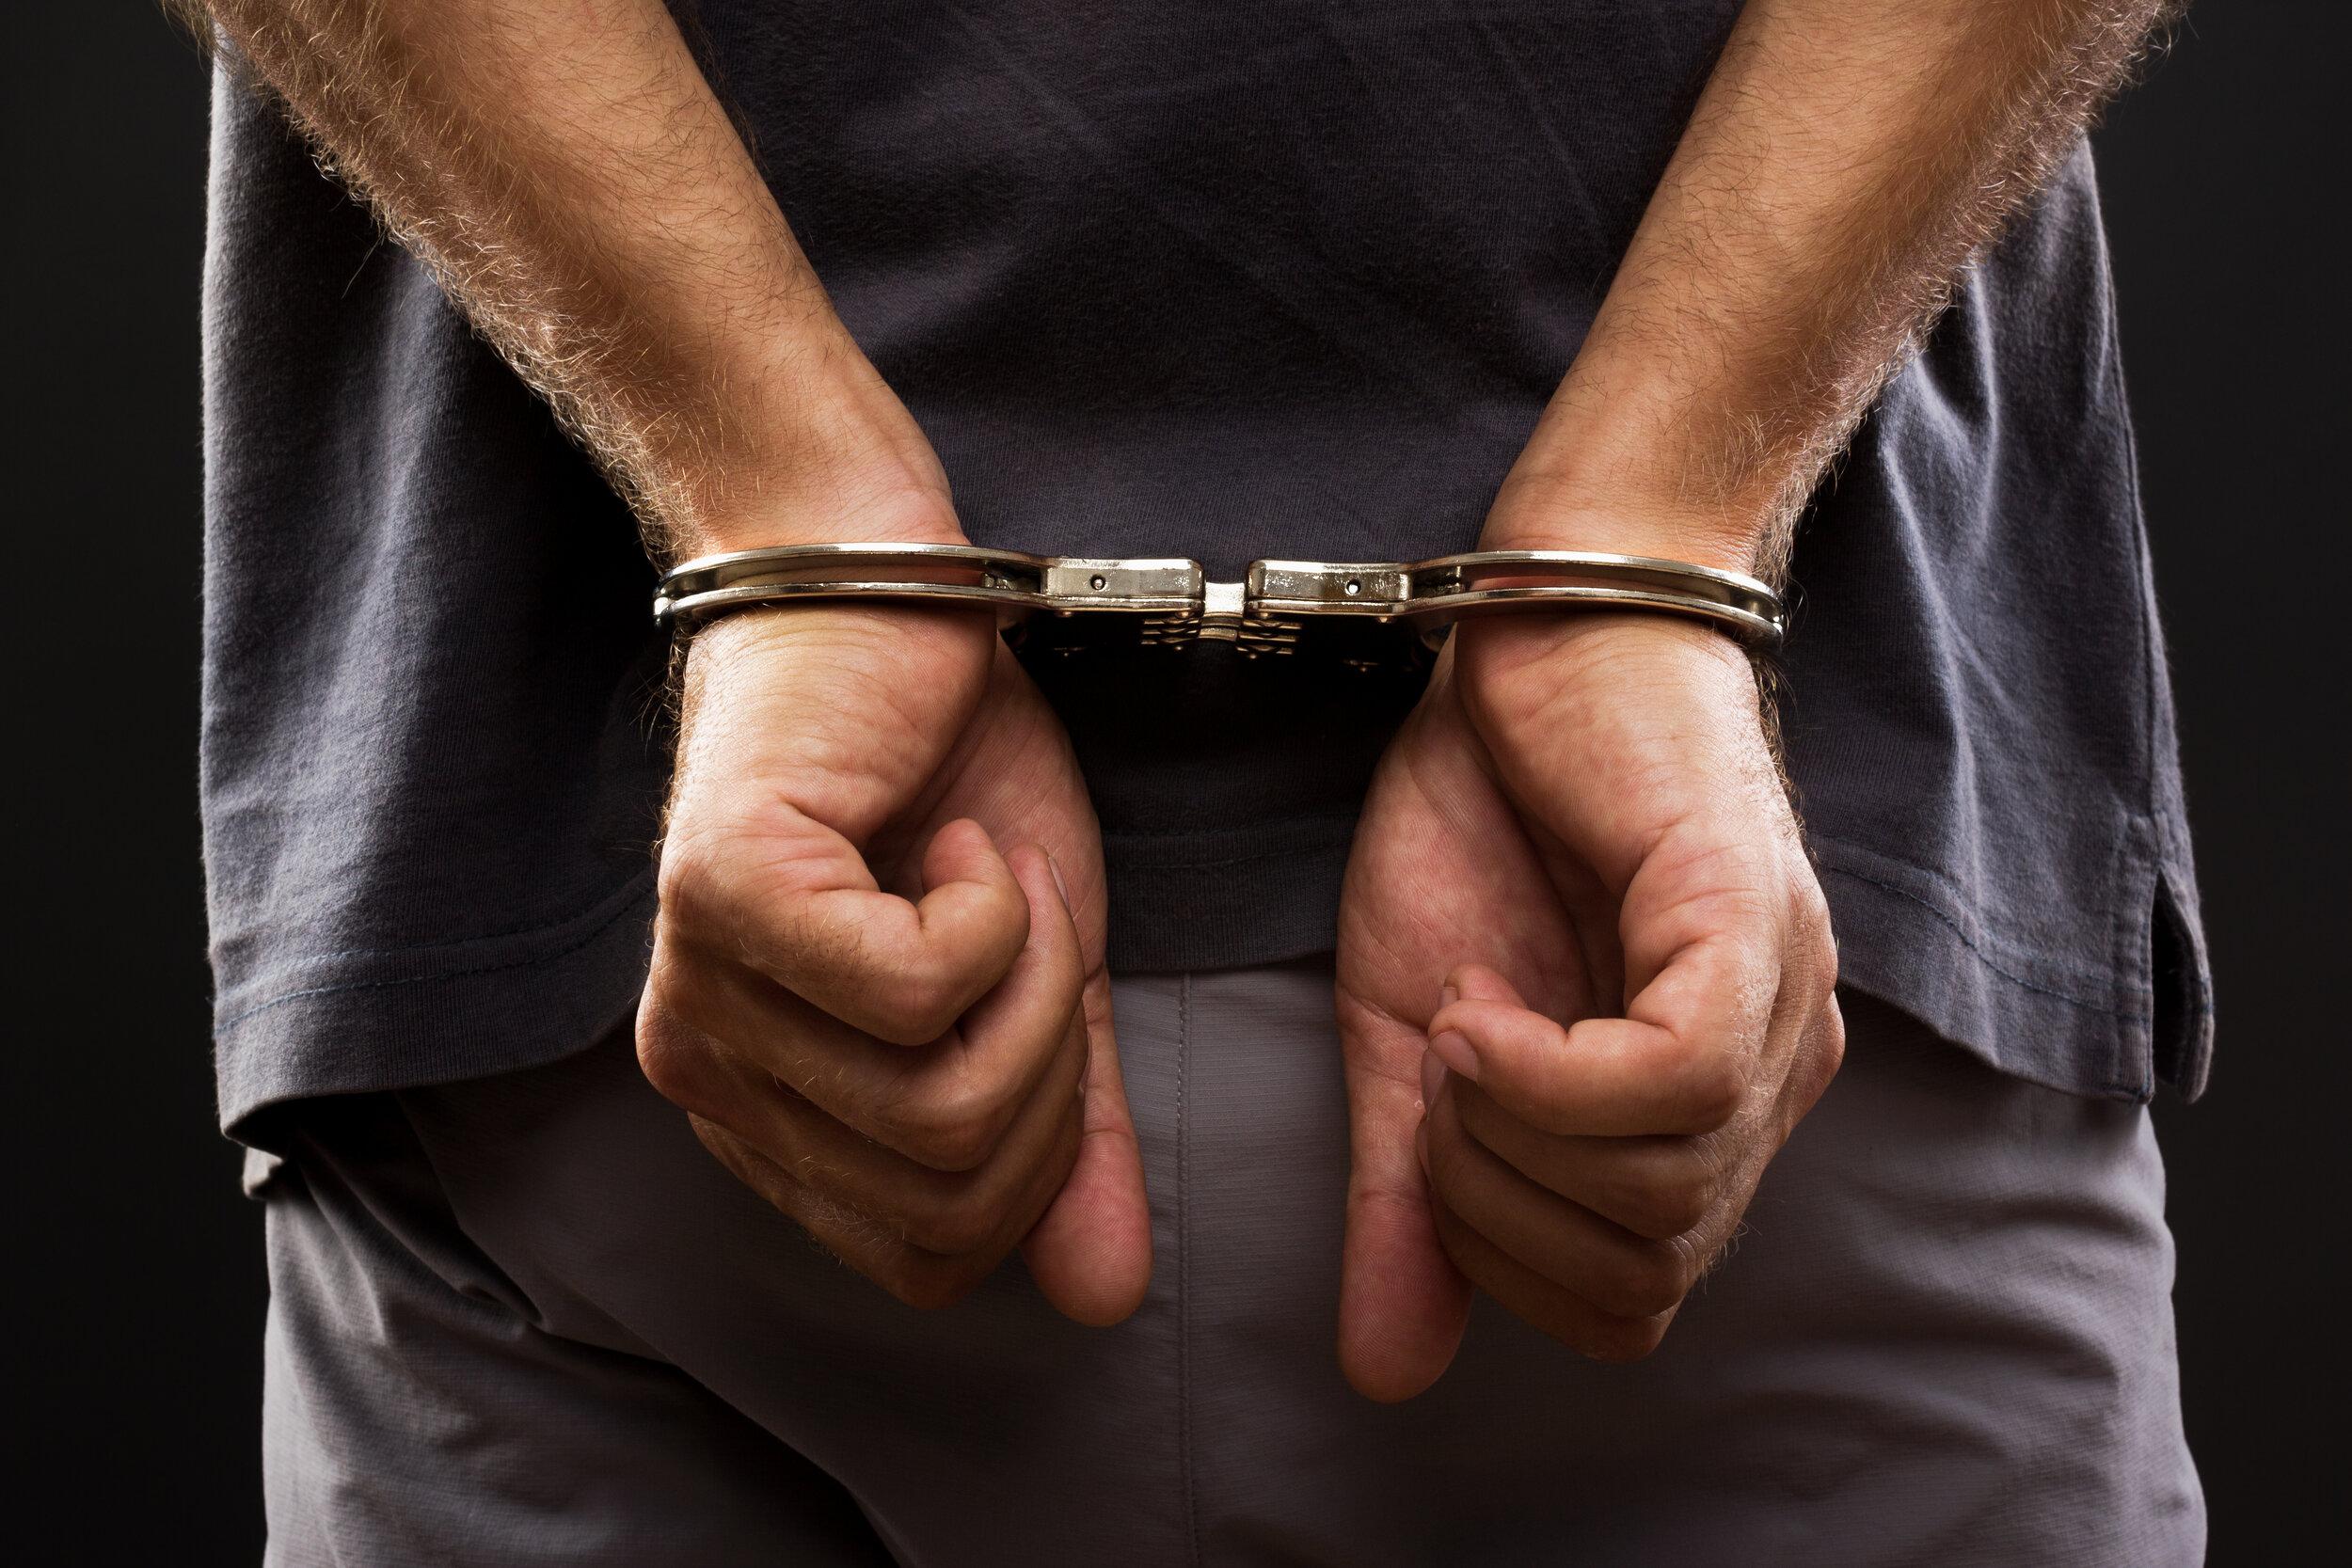 handcuffs_image